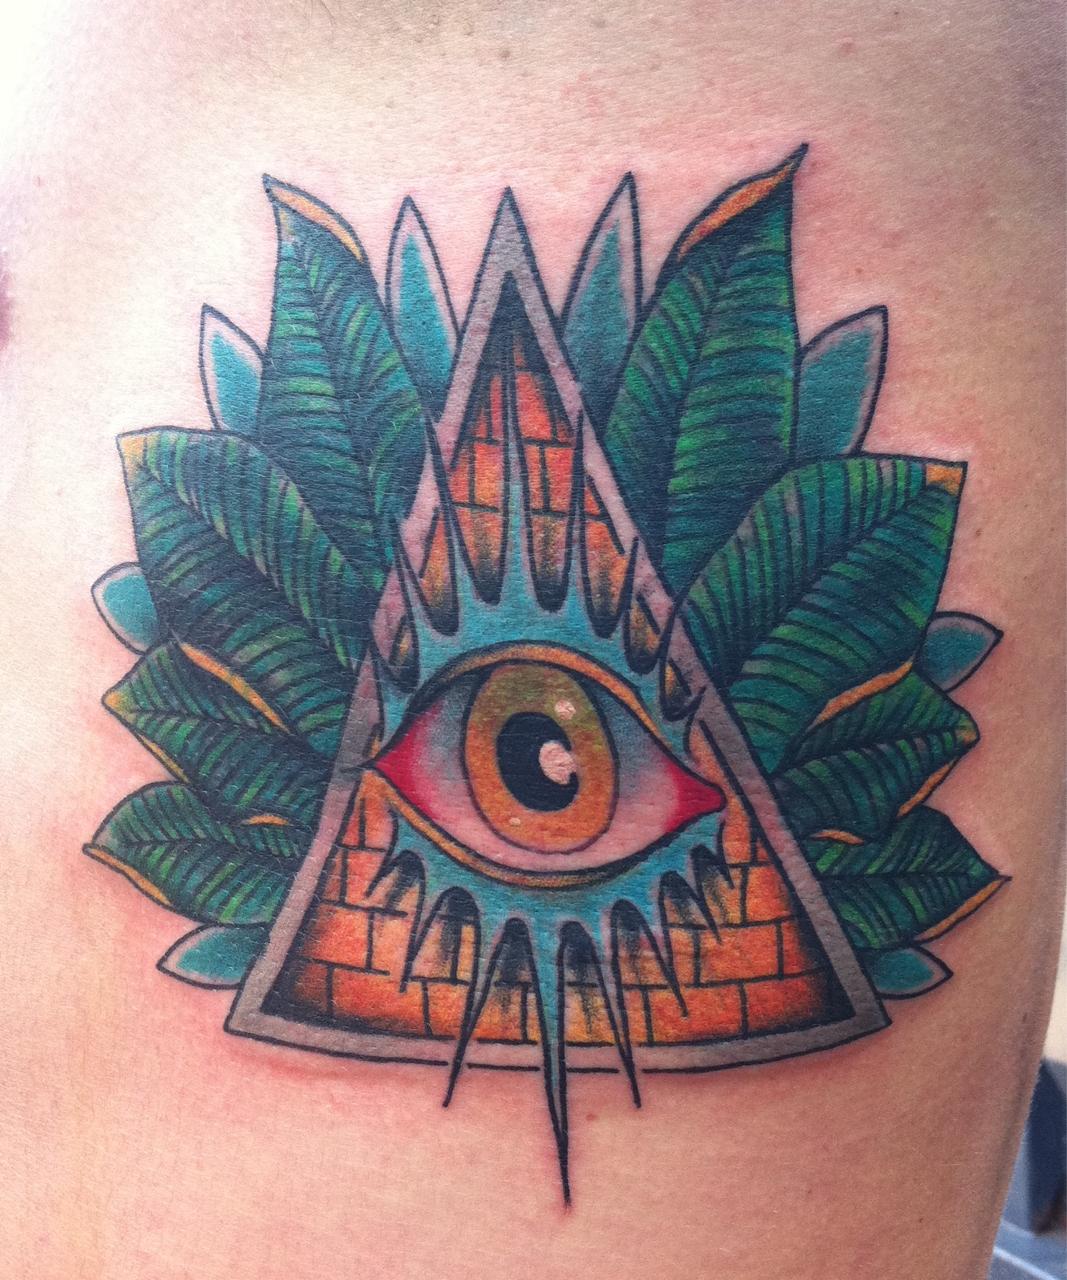 Illuminati Tattoos